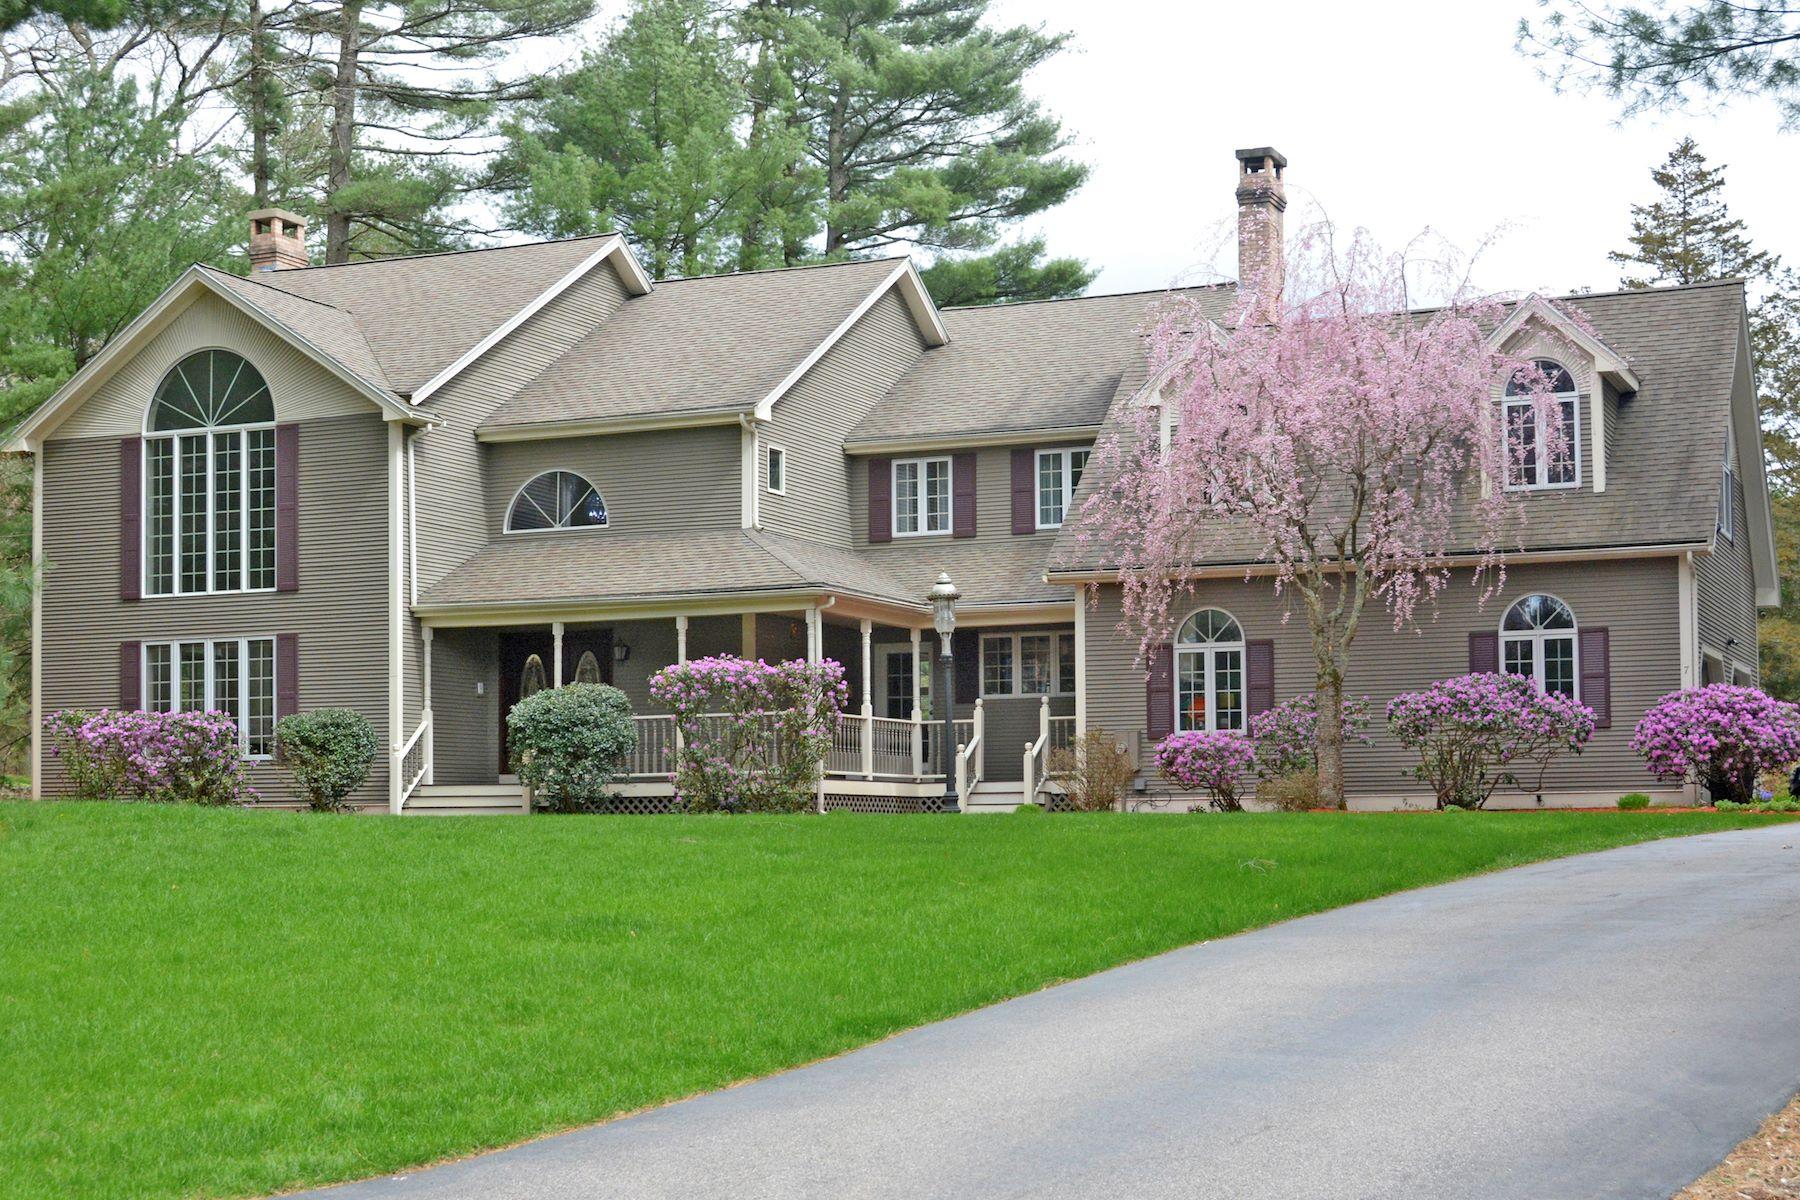 Single Family Home for Active at 7 Jorie Lane, Walpole 7 Jorie Lane Walpole, Massachusetts 02081 United States